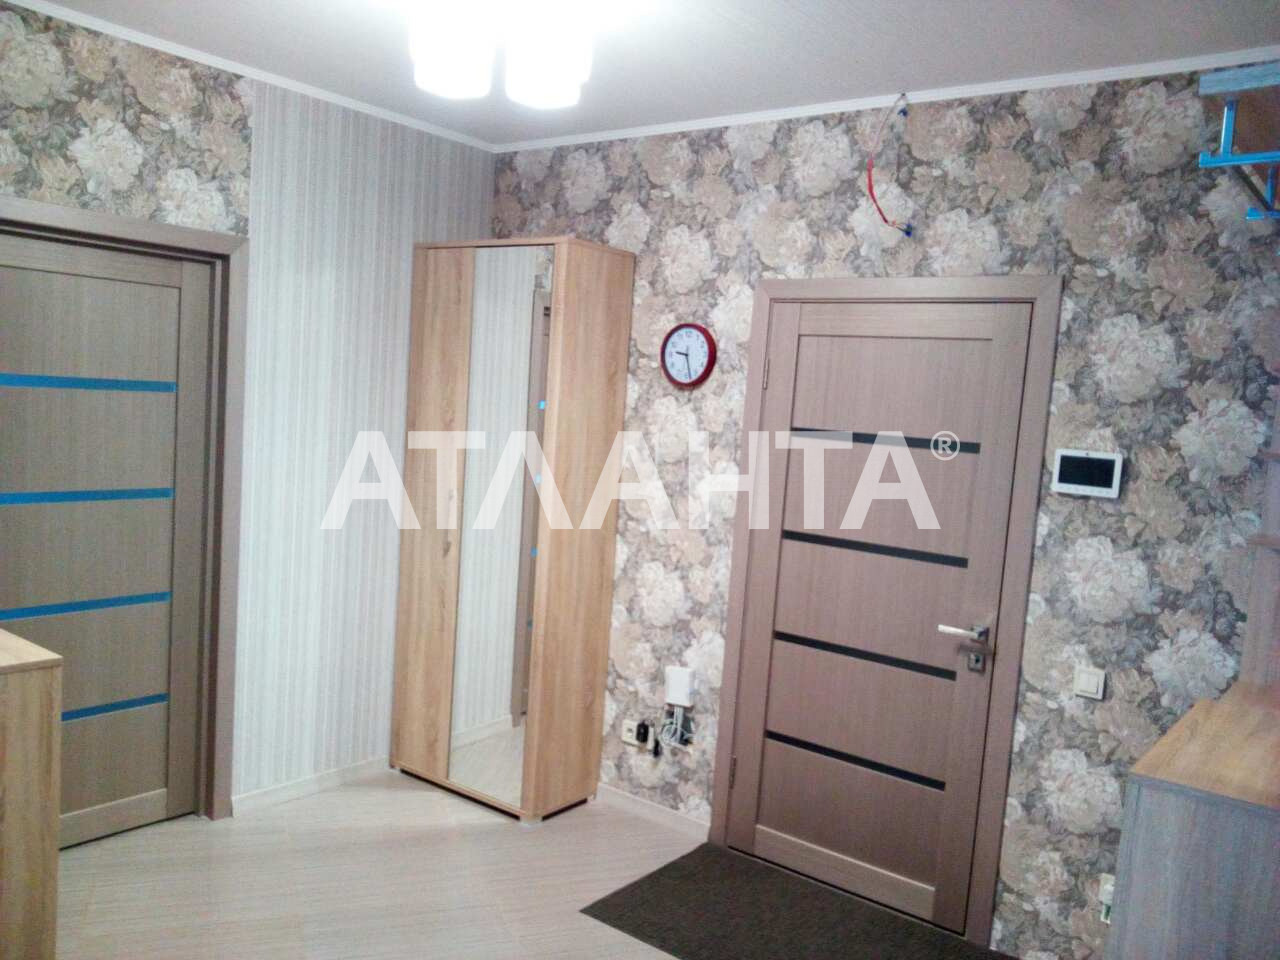 Продается 3-комнатная Квартира на ул. Просп. Глушкова — 139 000 у.е. (фото №4)